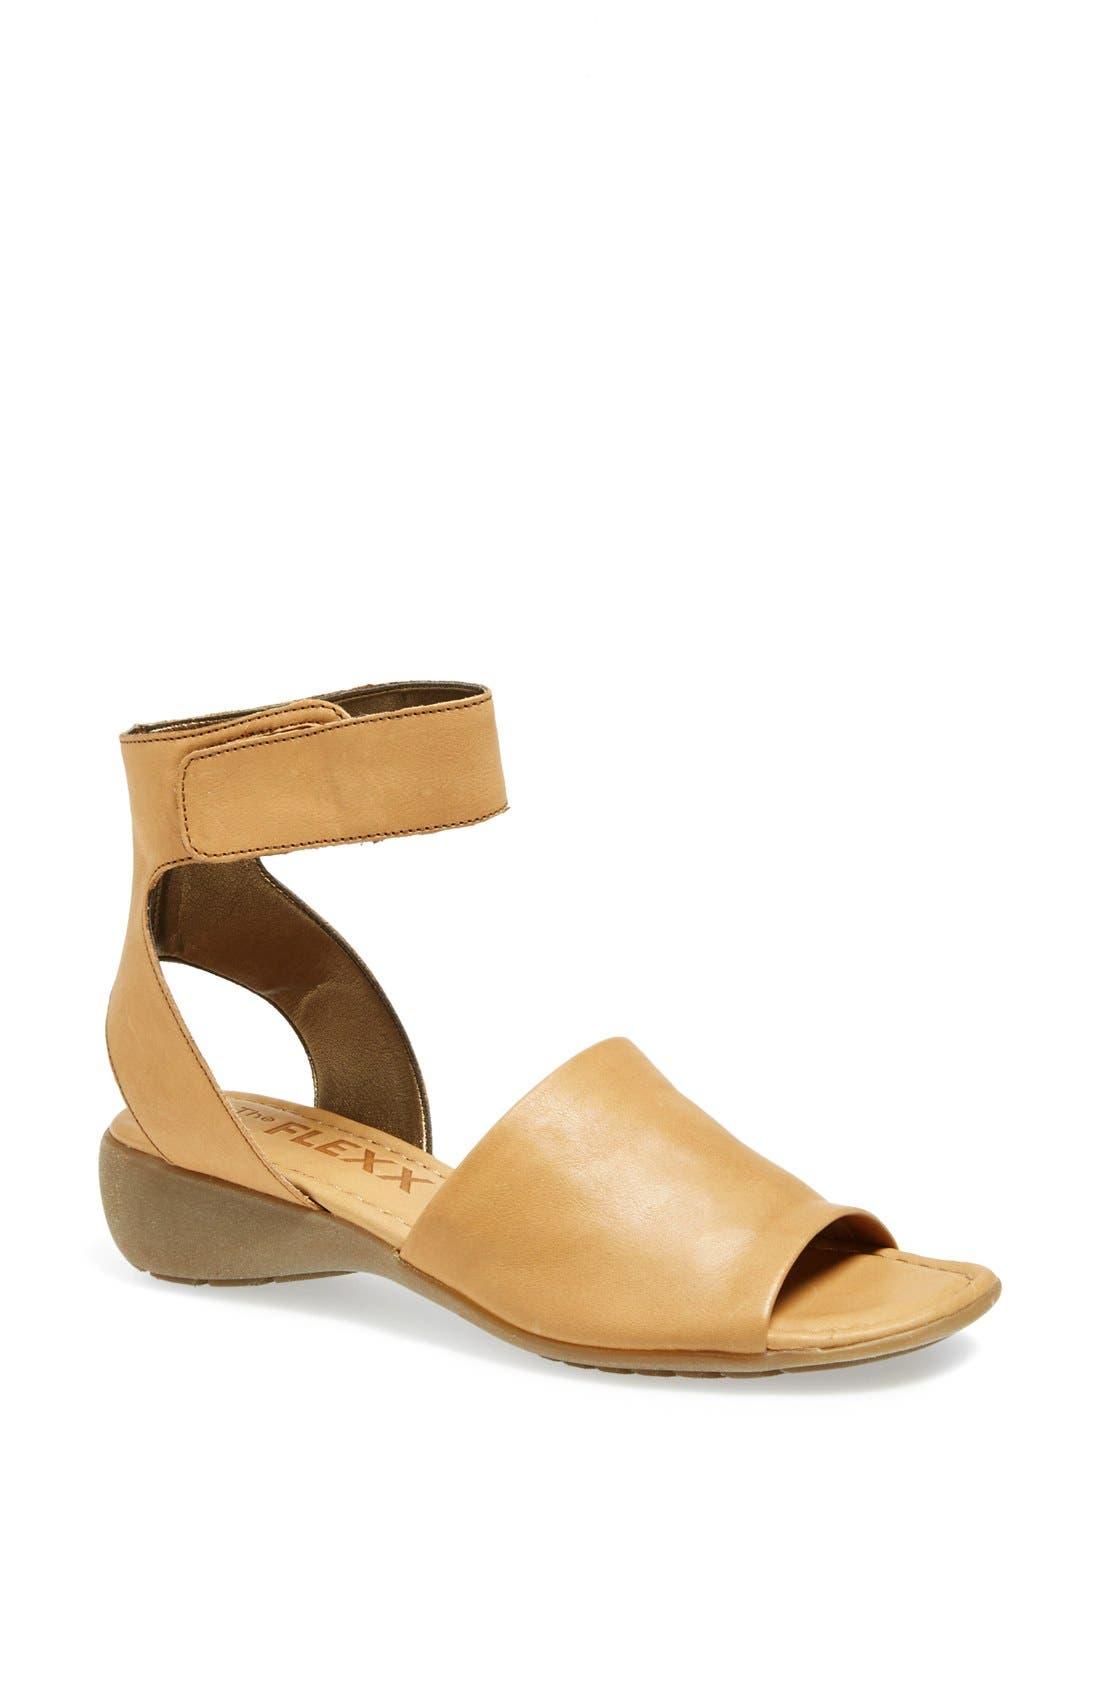 'Beglad' Leather Ankle Strap Sandal,                             Main thumbnail 9, color,